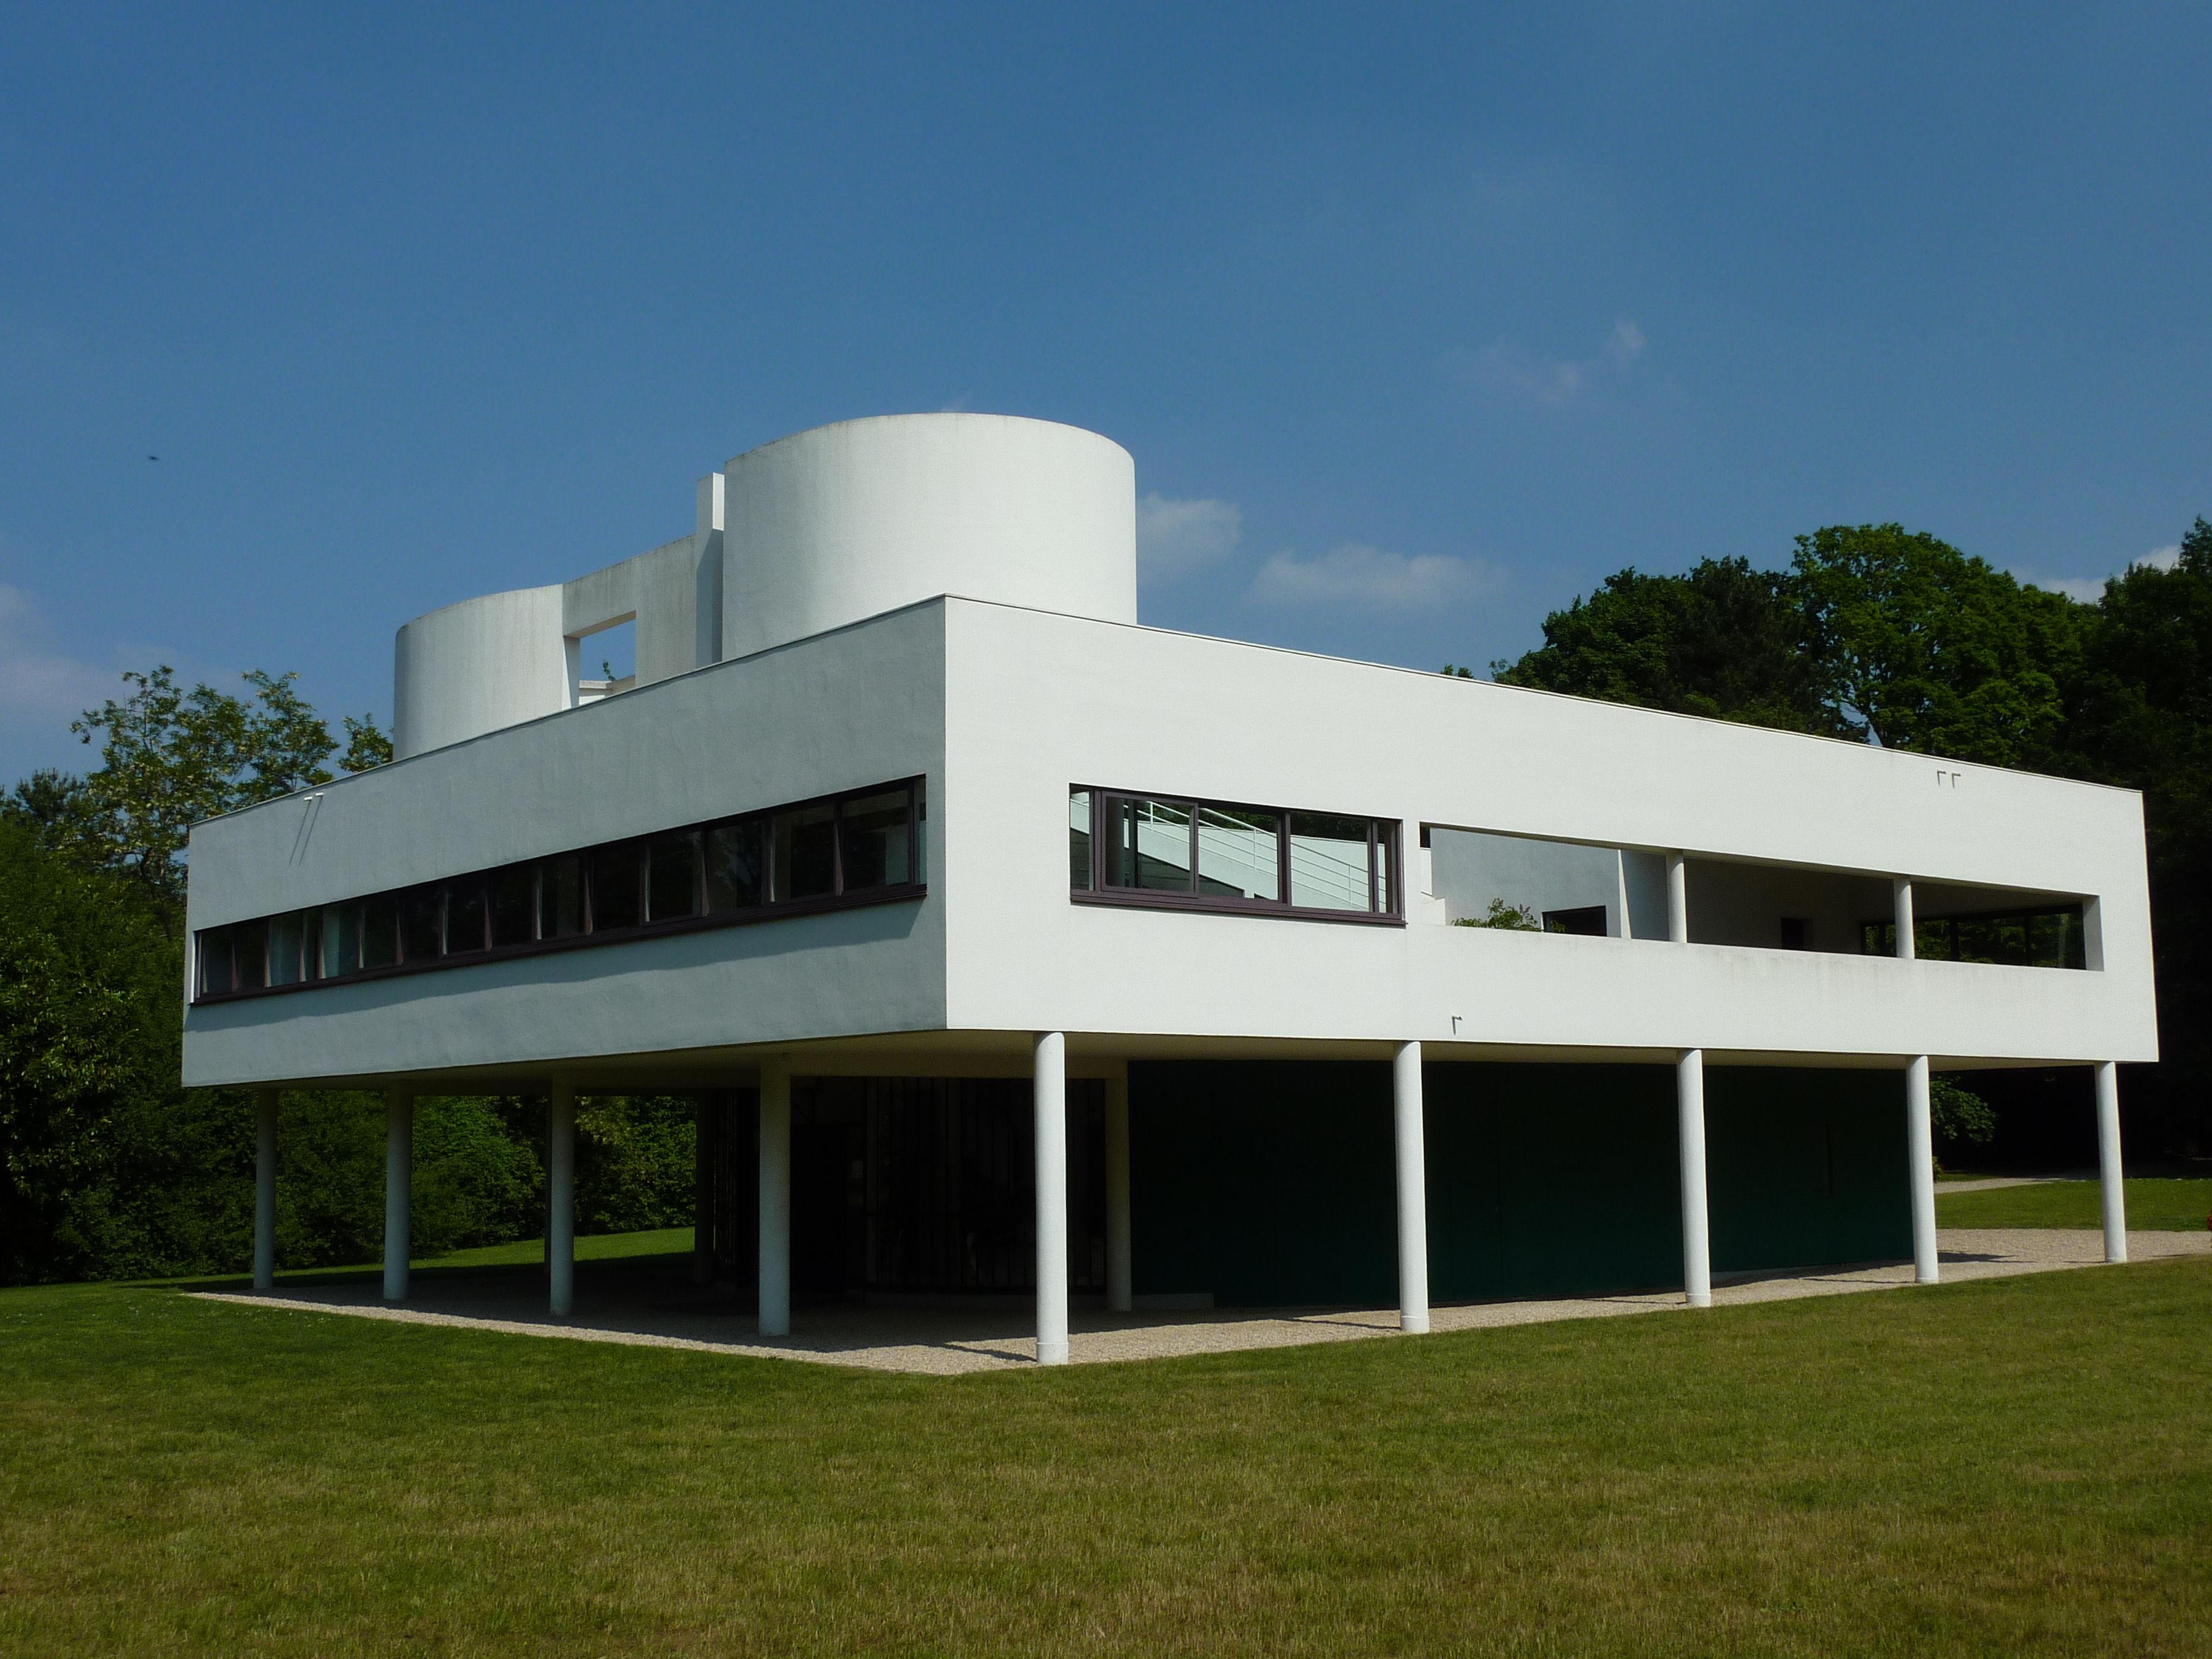 Modern Architecture Blog a masterpiece of modern architecture - paris insights - the blog